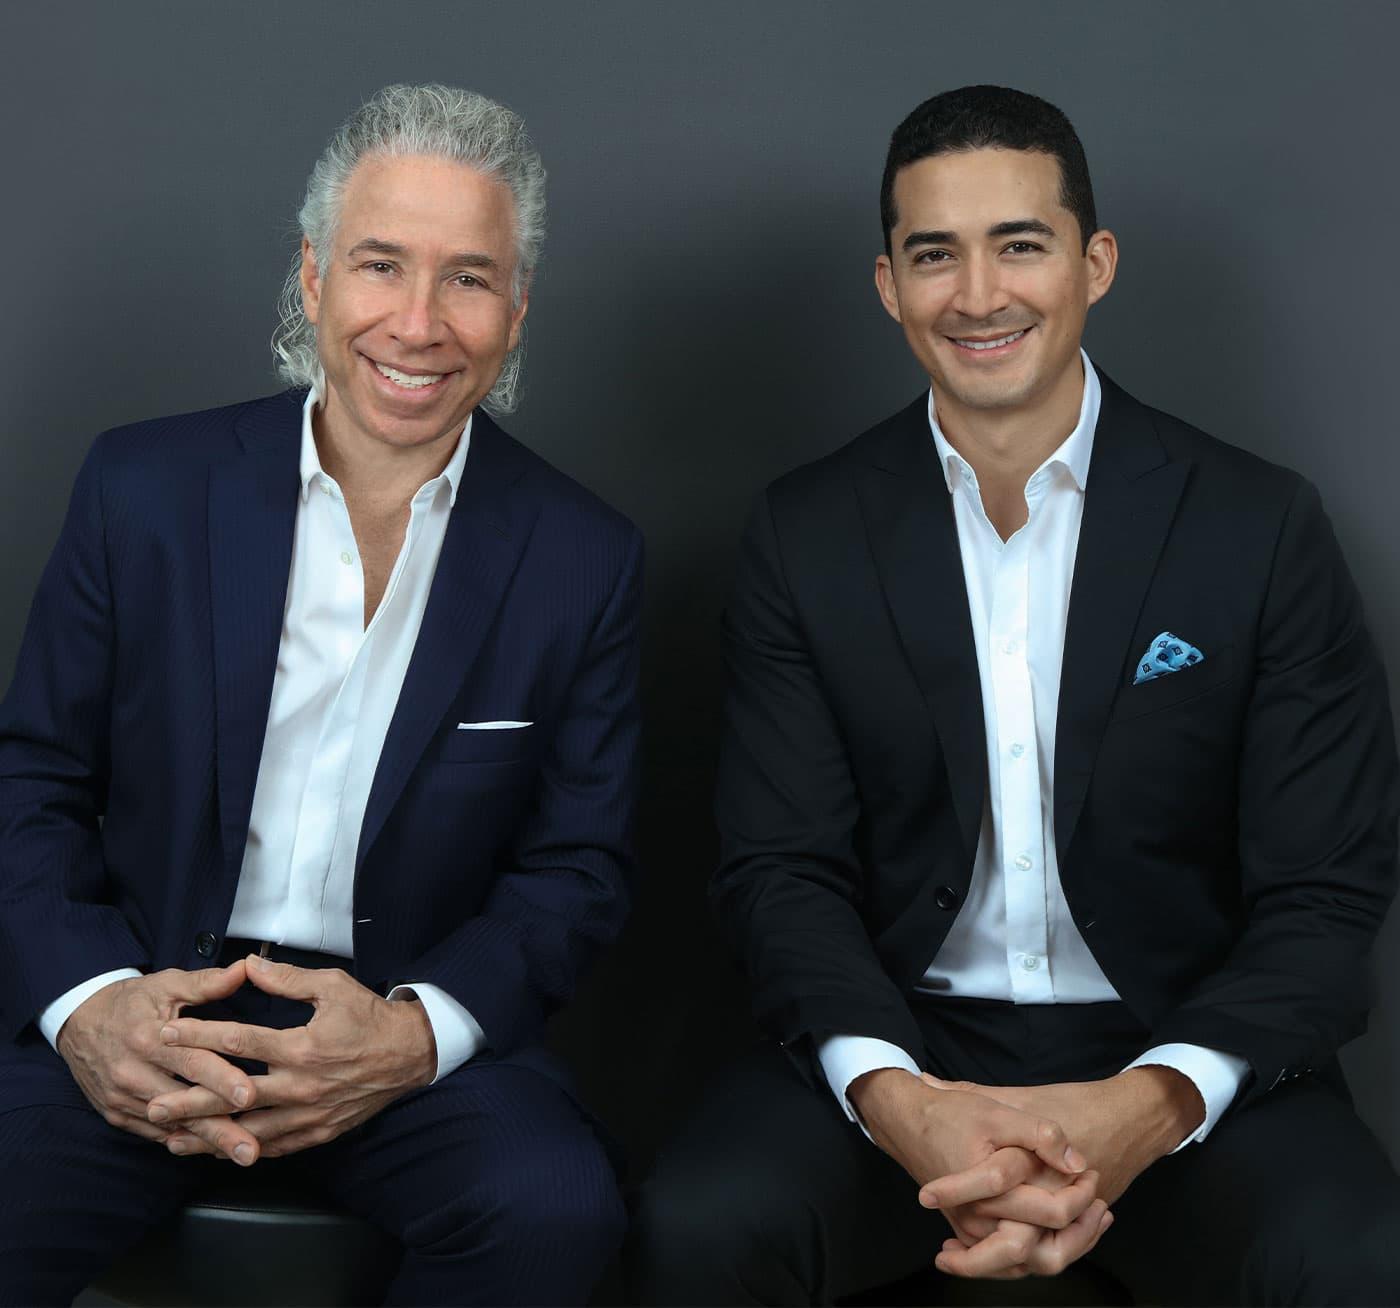 Dr. Fagien and Dr. Vaca